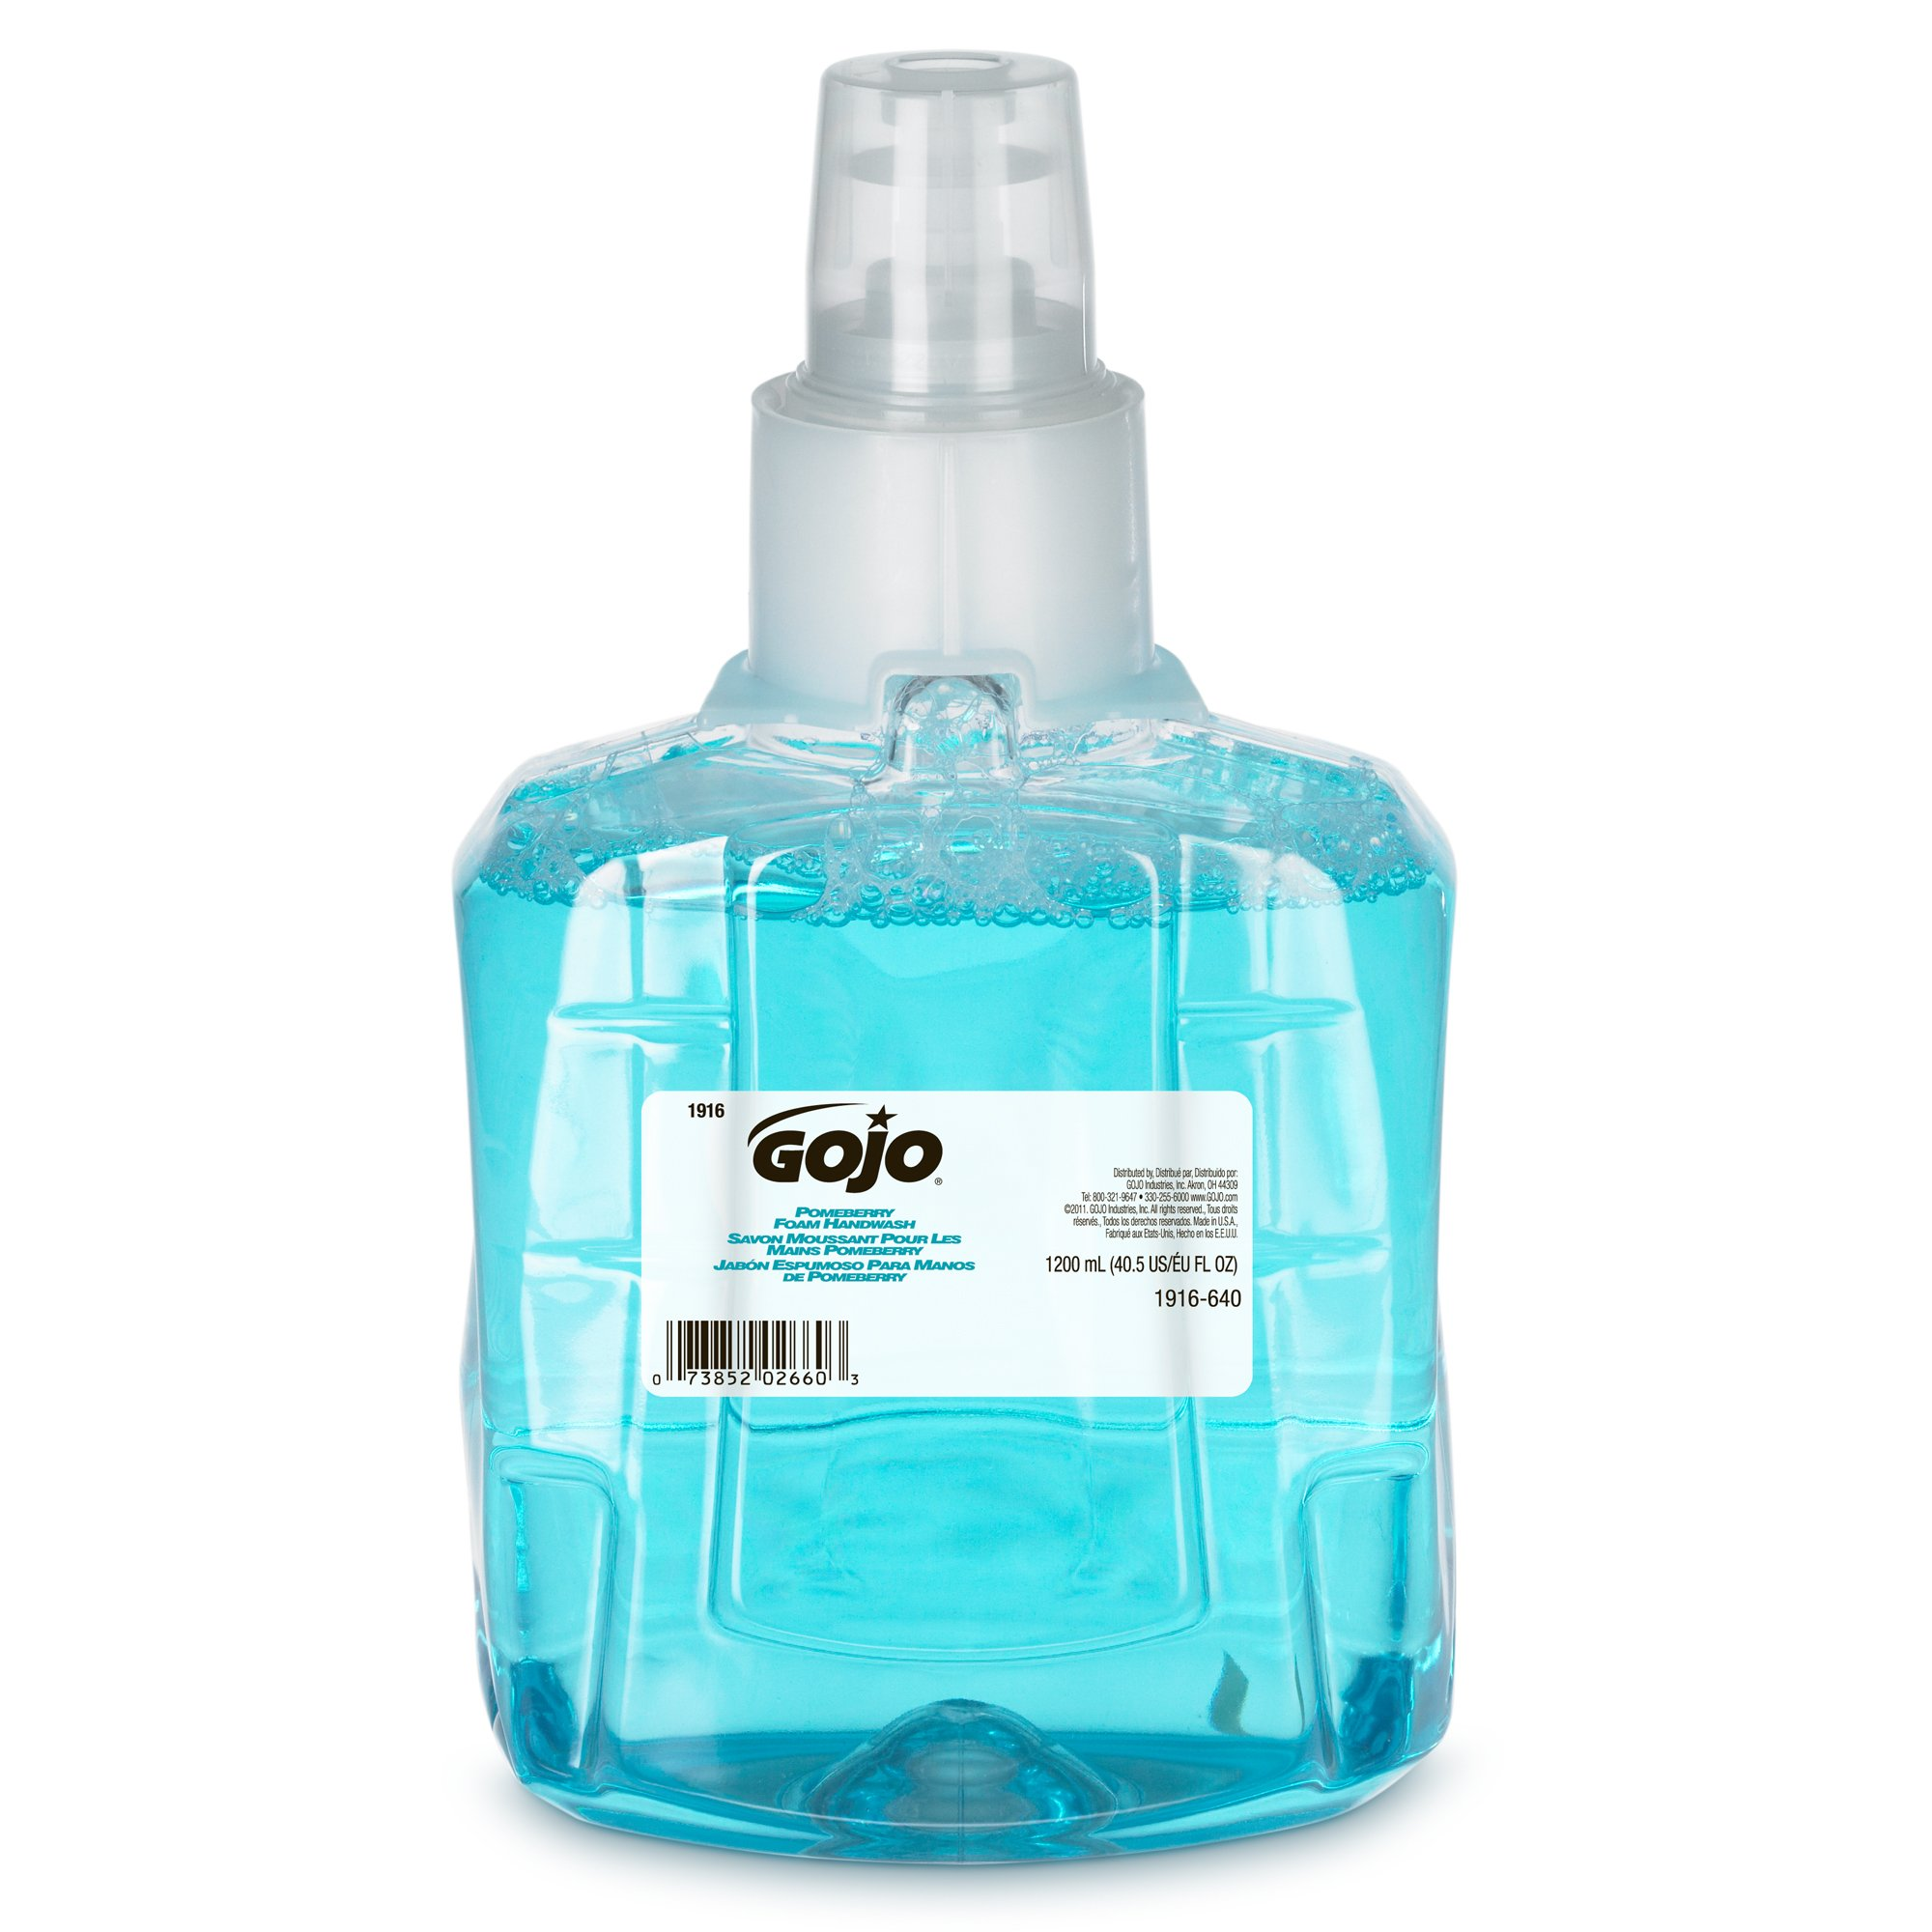 GOJO Green Certified Foam Soap Handwash Refill - Pomeberry Scented Hand Soap Refill, 1200mL Refill for LTX-12 Dispenser (Pack of 2) - 1916-02